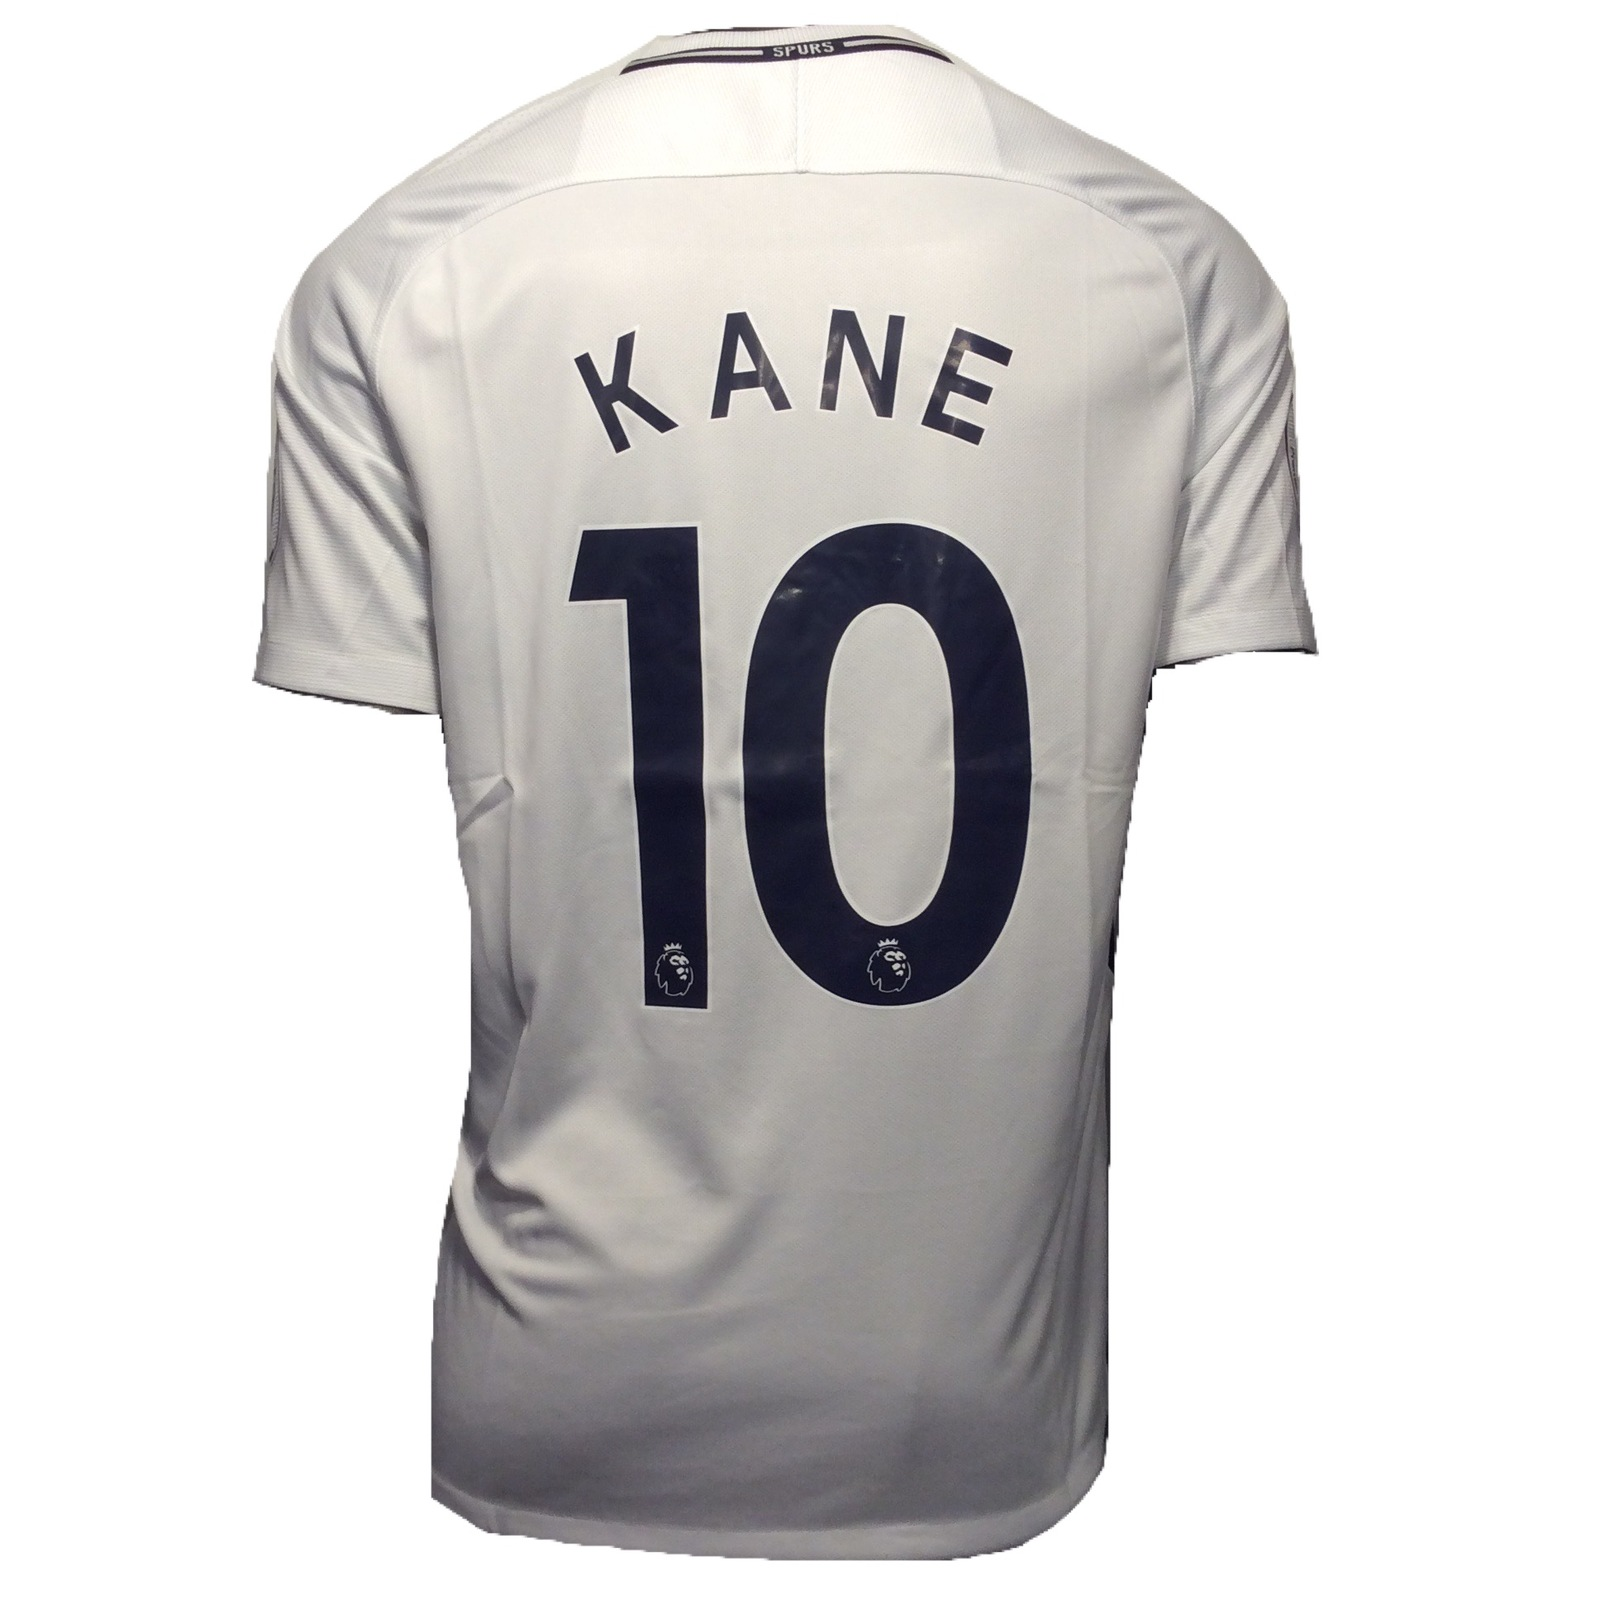 93b4bb608cc 2017-18 Tottenham Harry Kane #10 Men's XL and 37 similar items